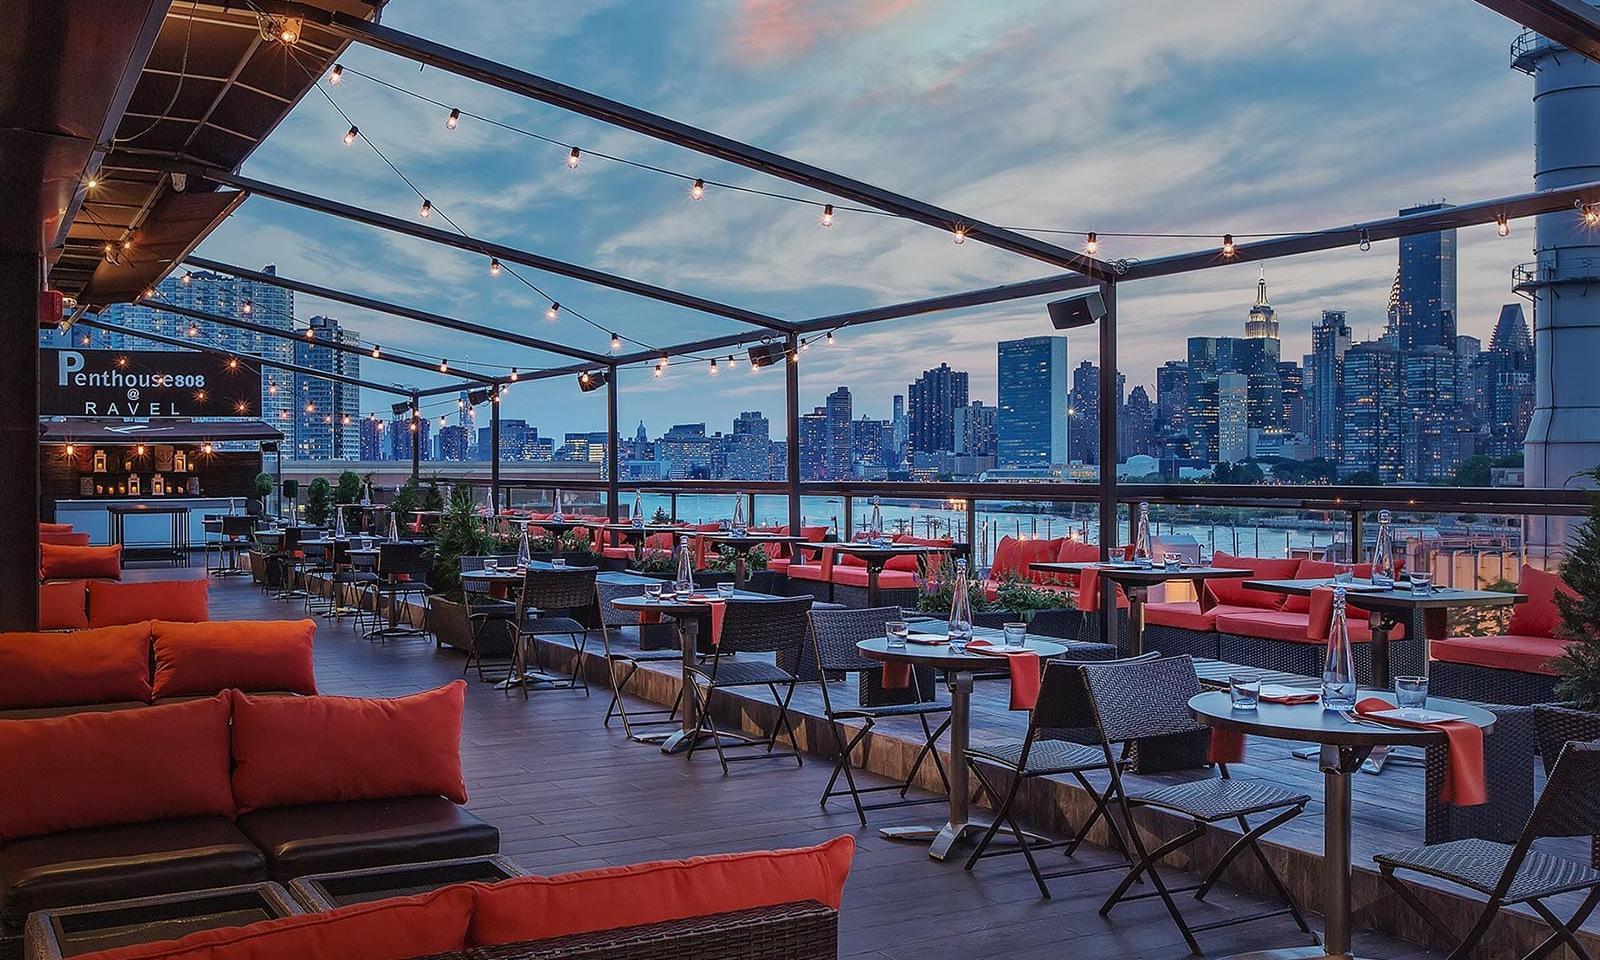 Penthouse808 Rooftop bar New York Queens08